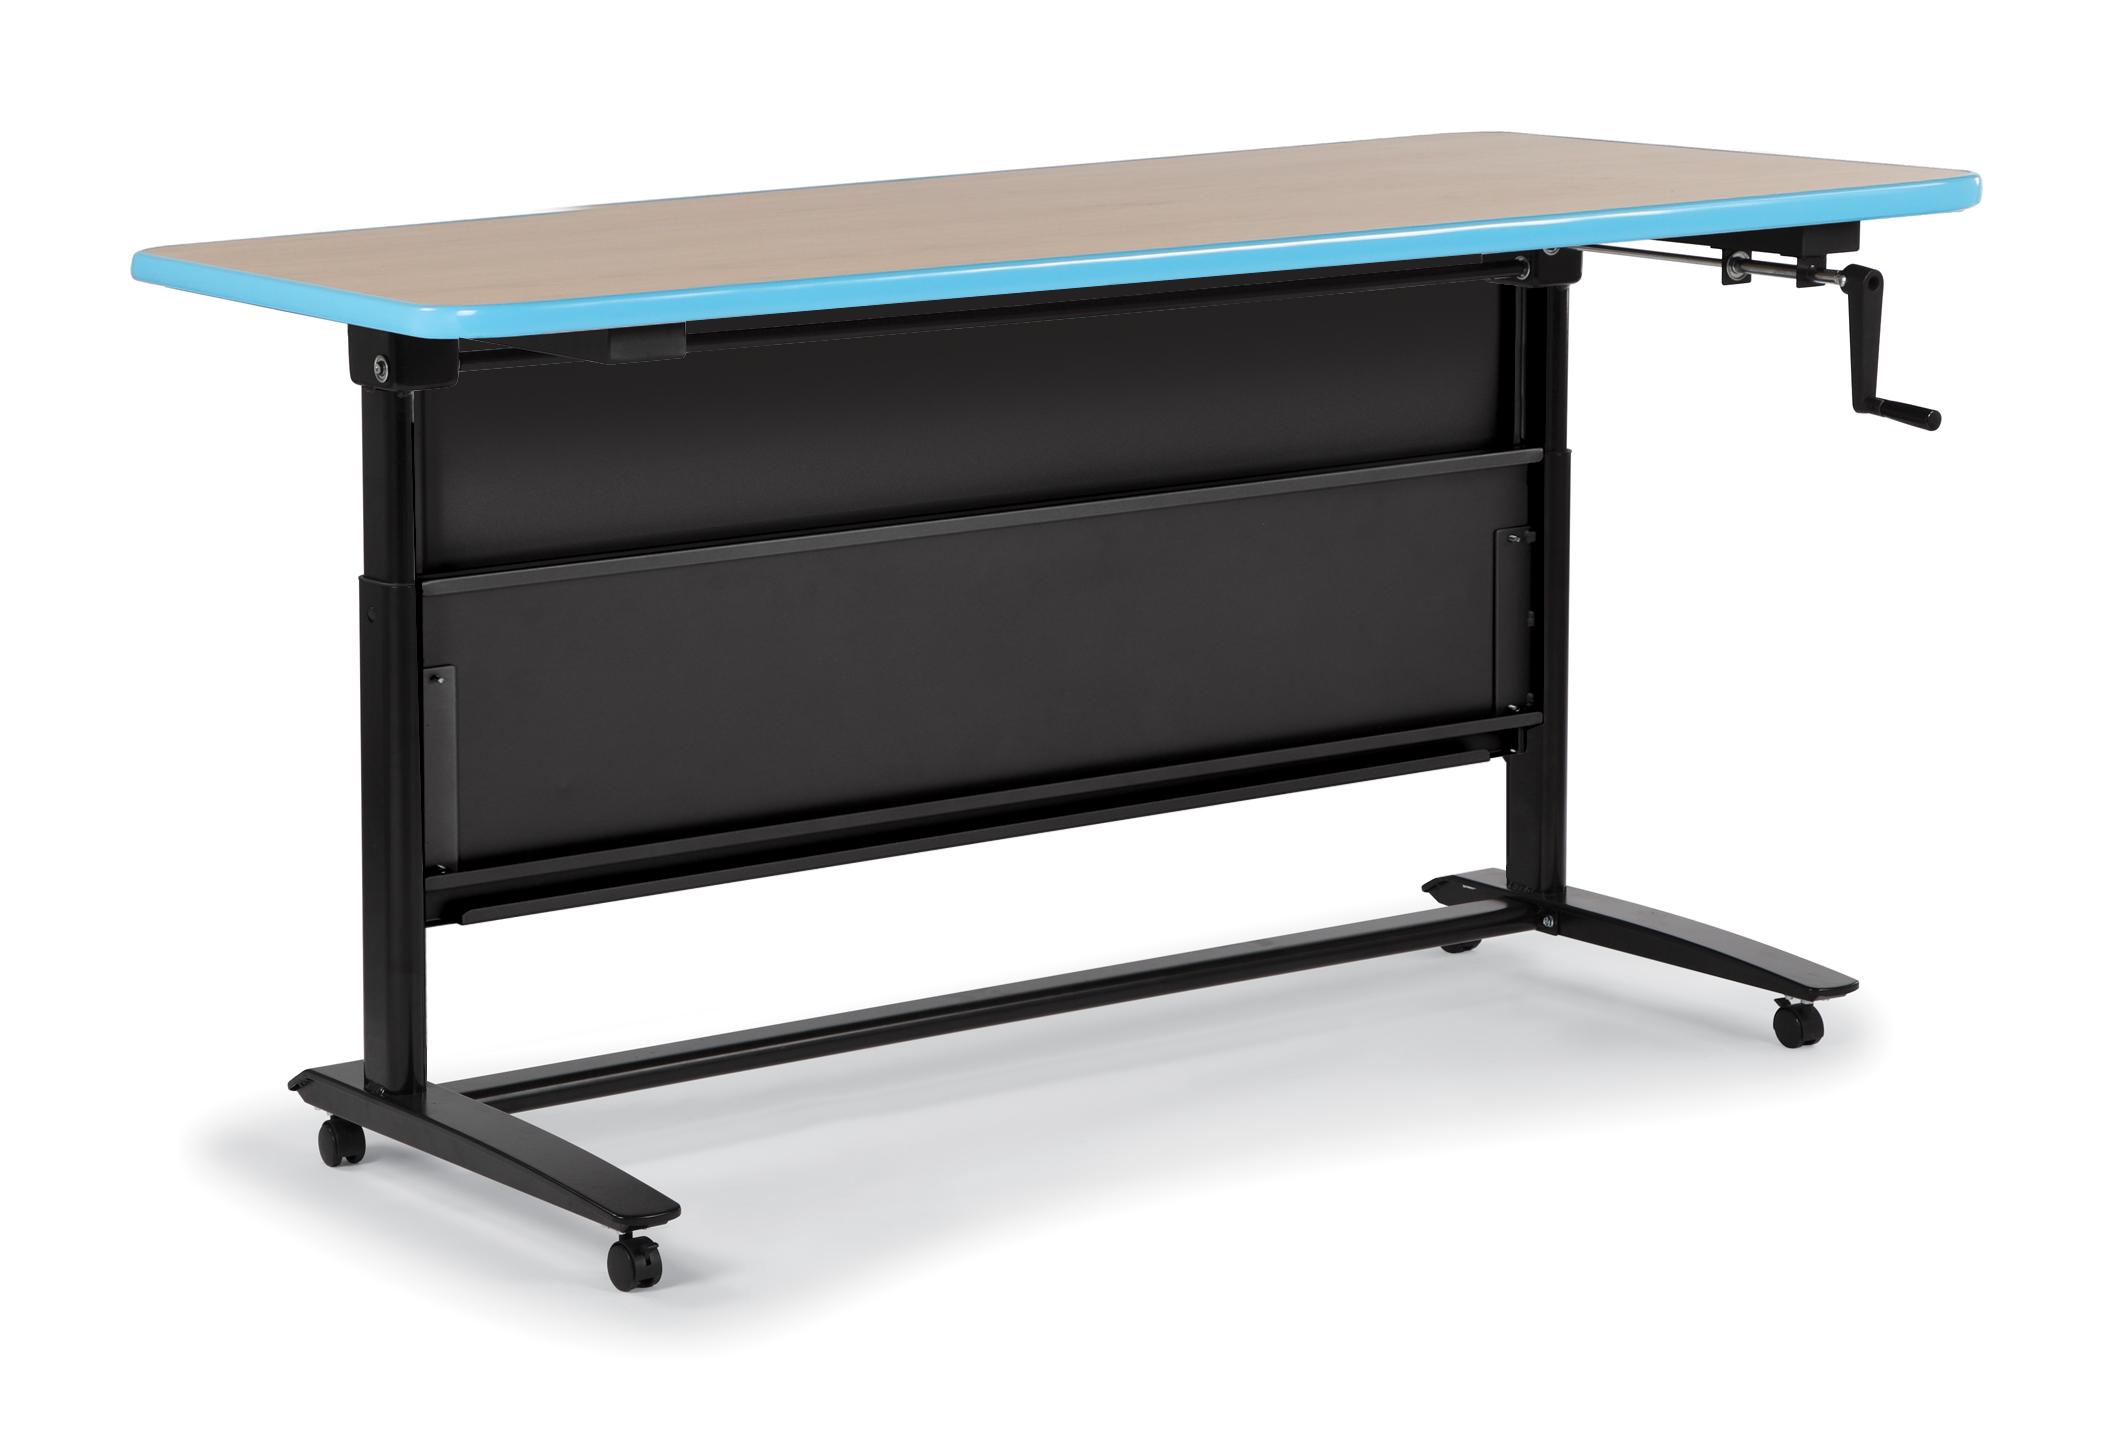 Desk Lift System